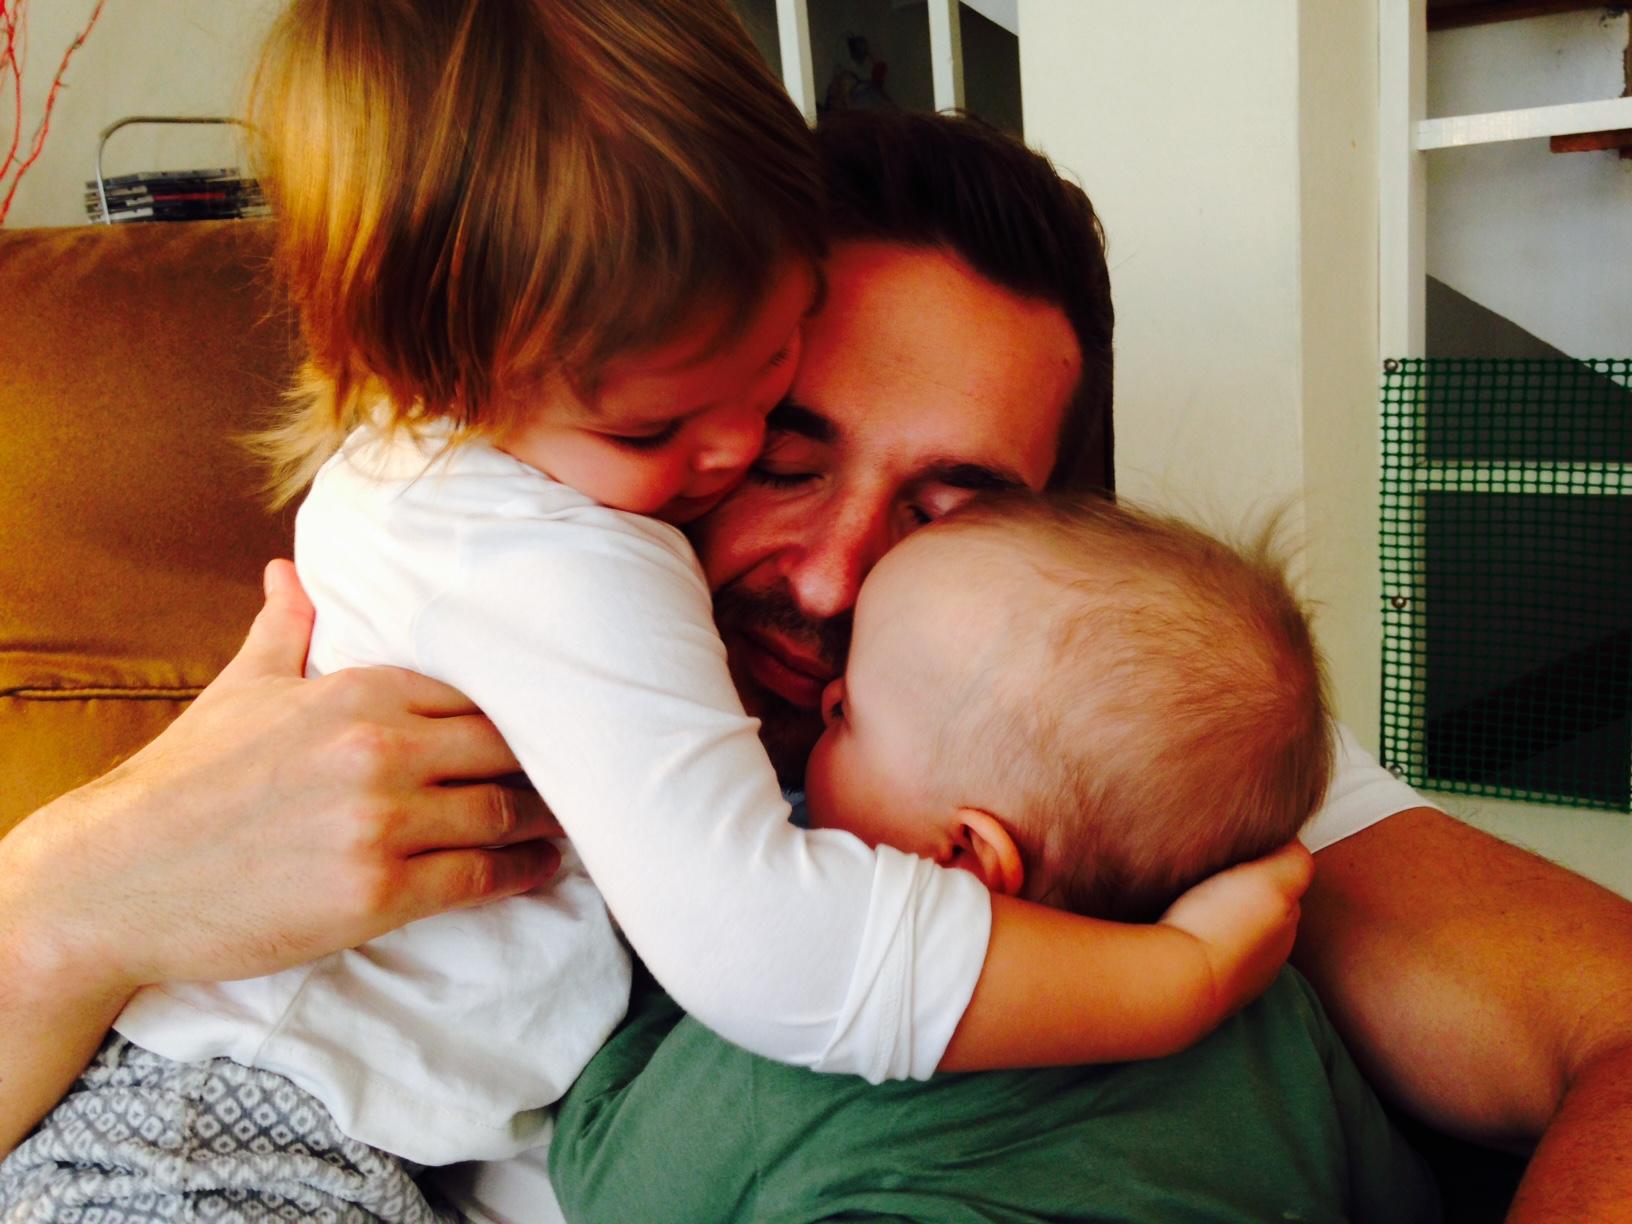 Randki ojca i córki